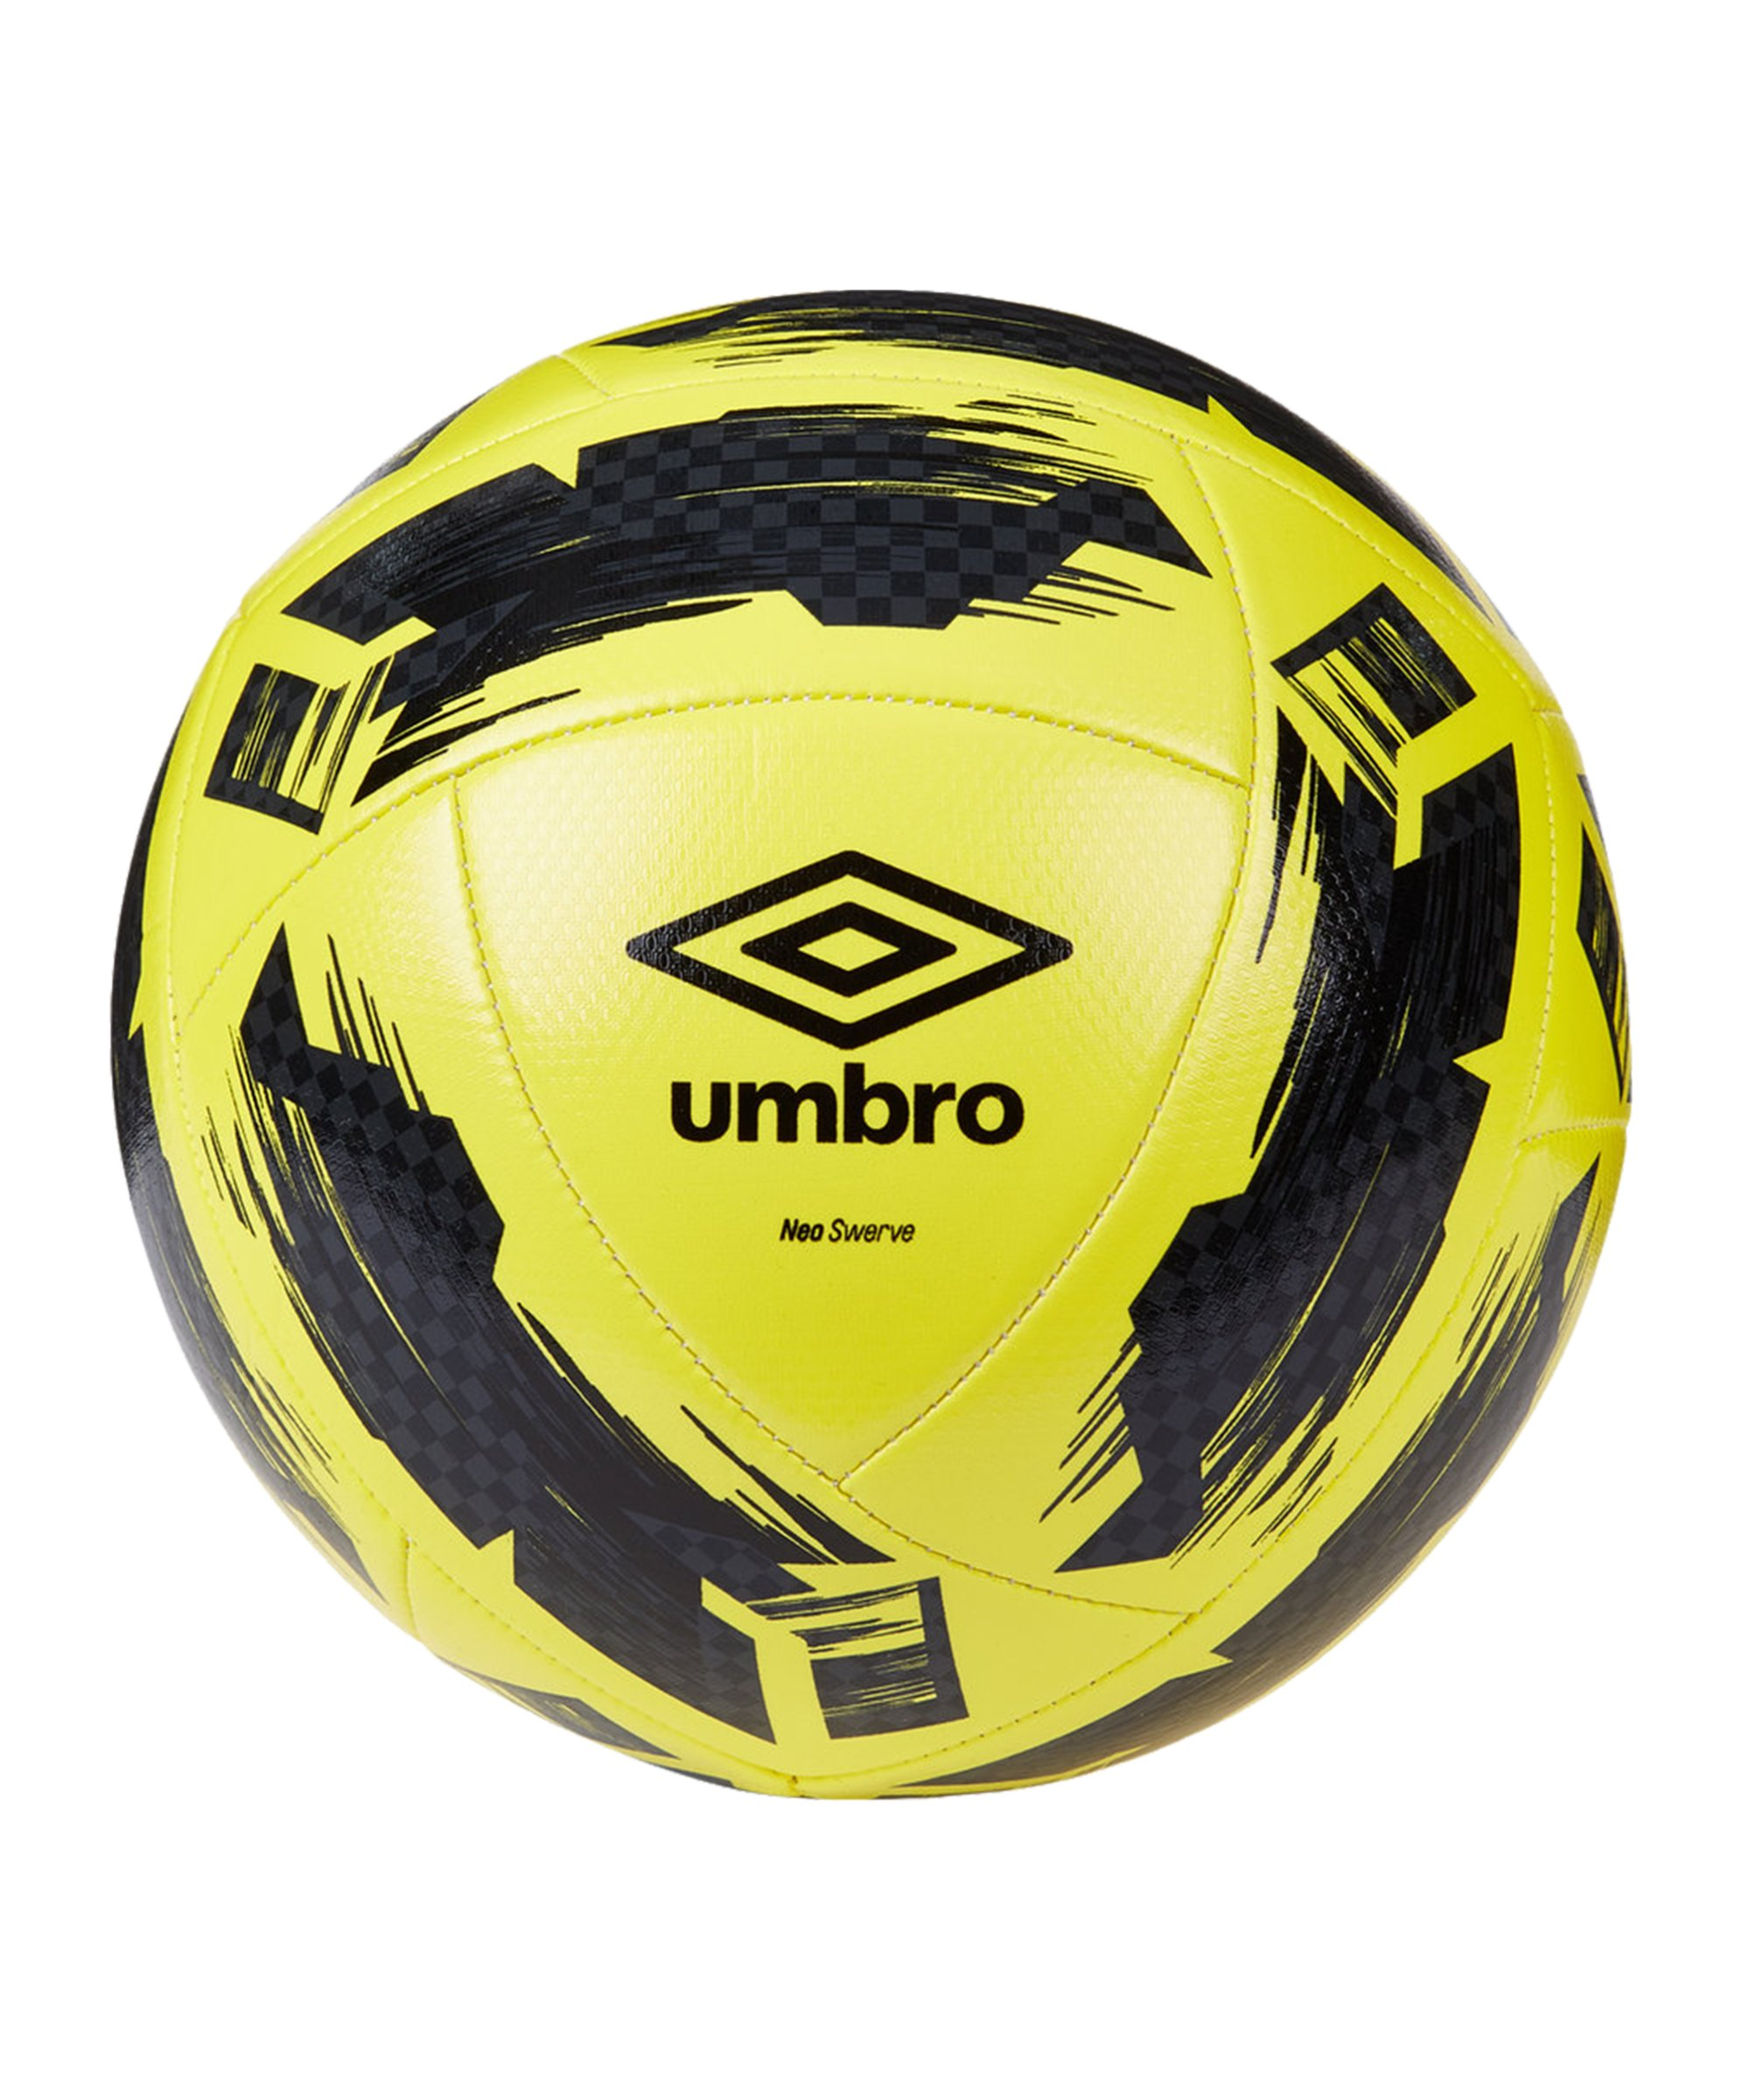 Umbro Neo Swerve Trainingsball Gelb Schwarz F157 - gelb